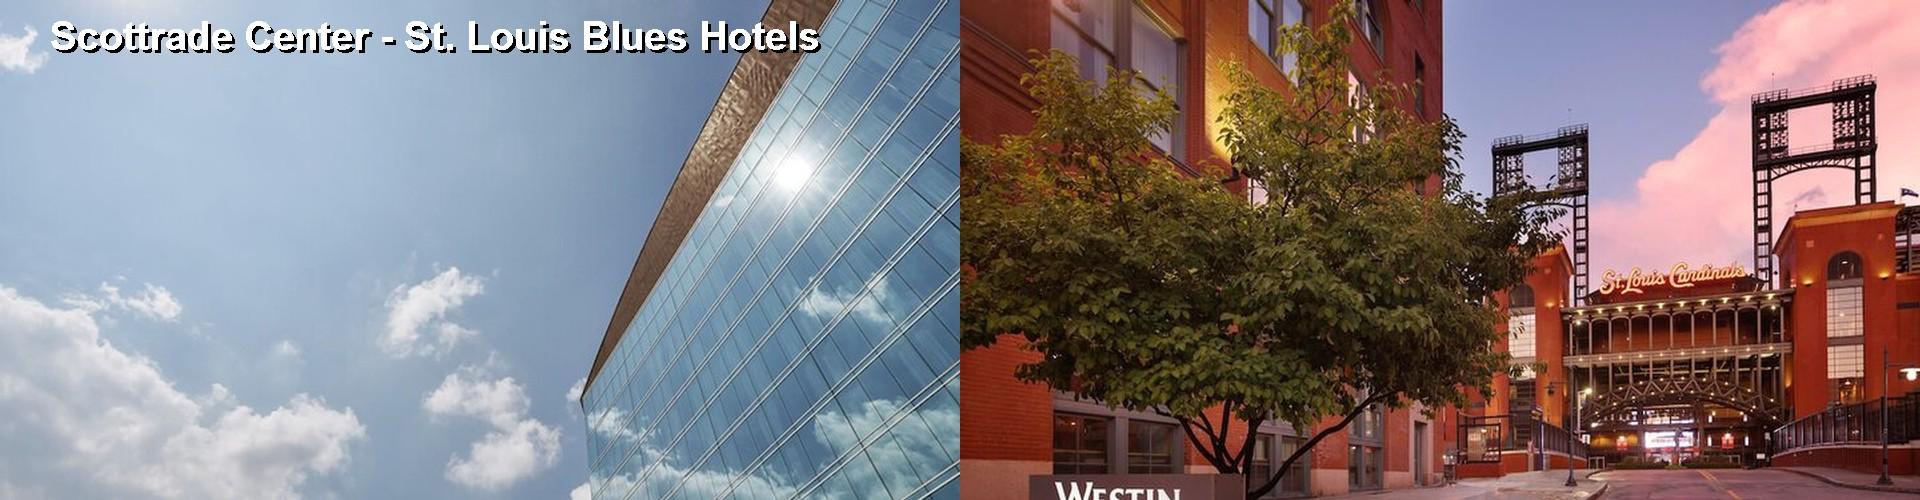 5 Best Hotels Near Scottrade Center St Louis Blues